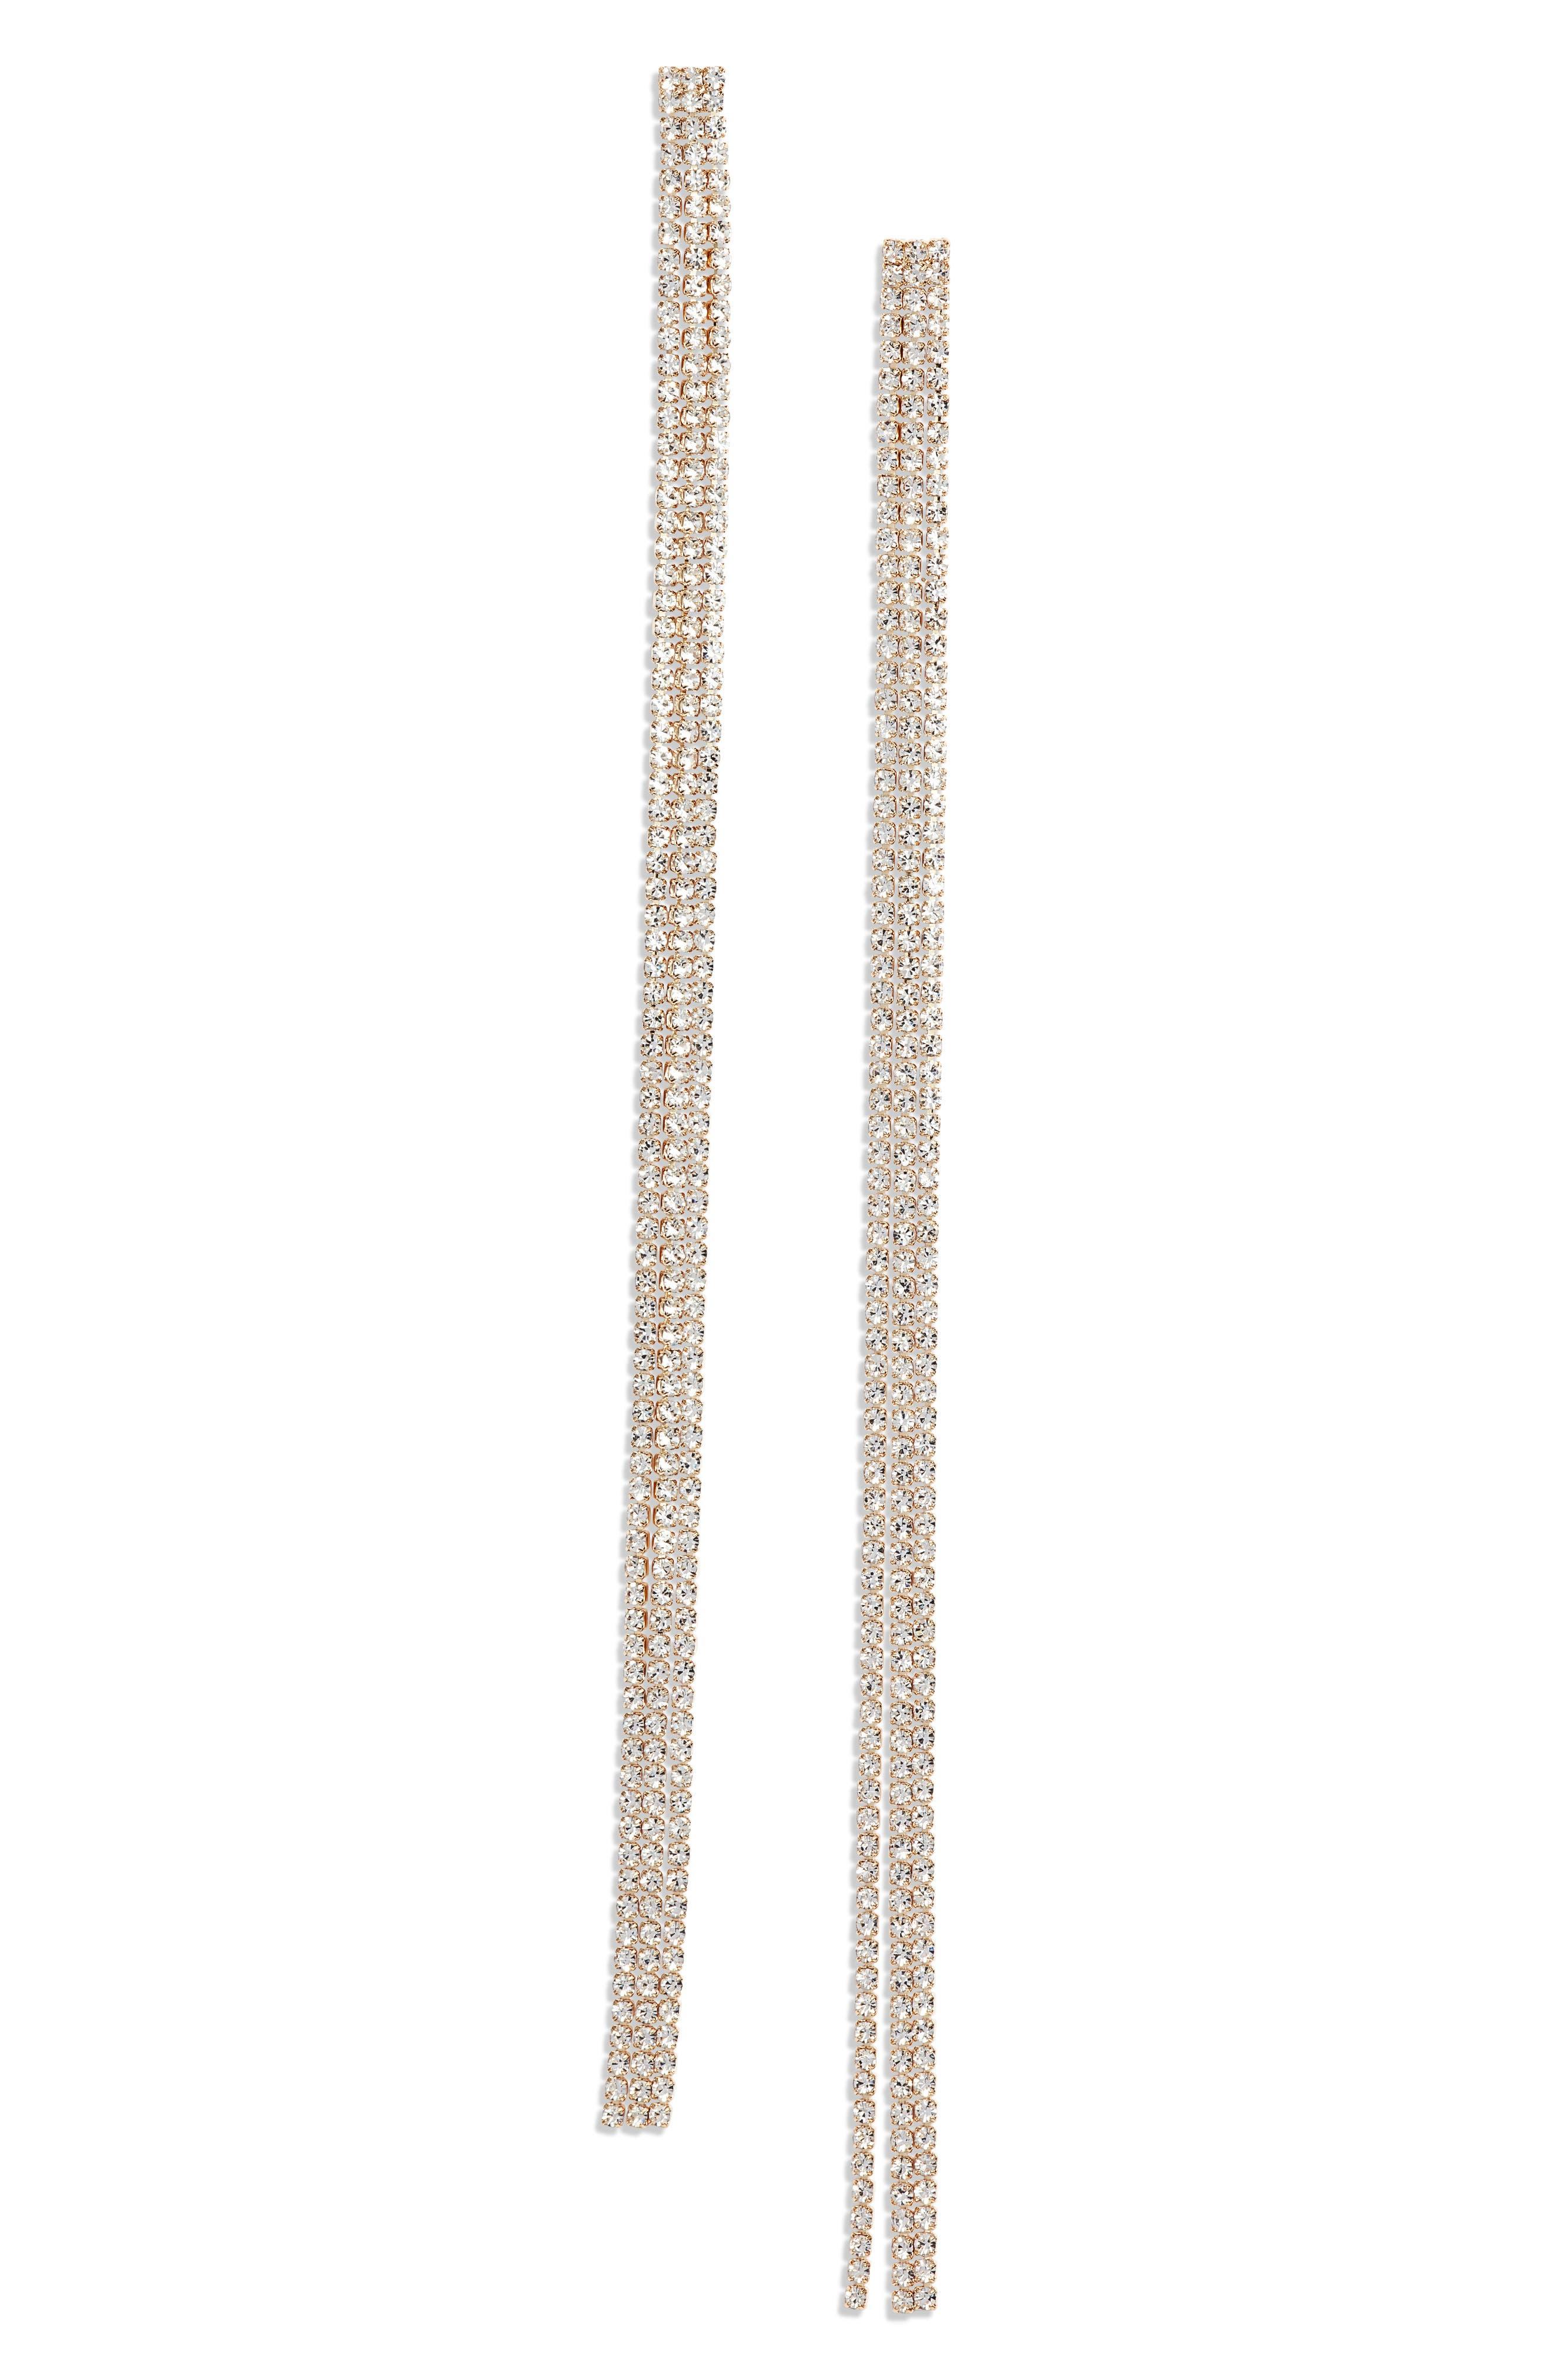 Long Drama Linear Earrings,                             Main thumbnail 1, color,                             CLEAR- GOLD